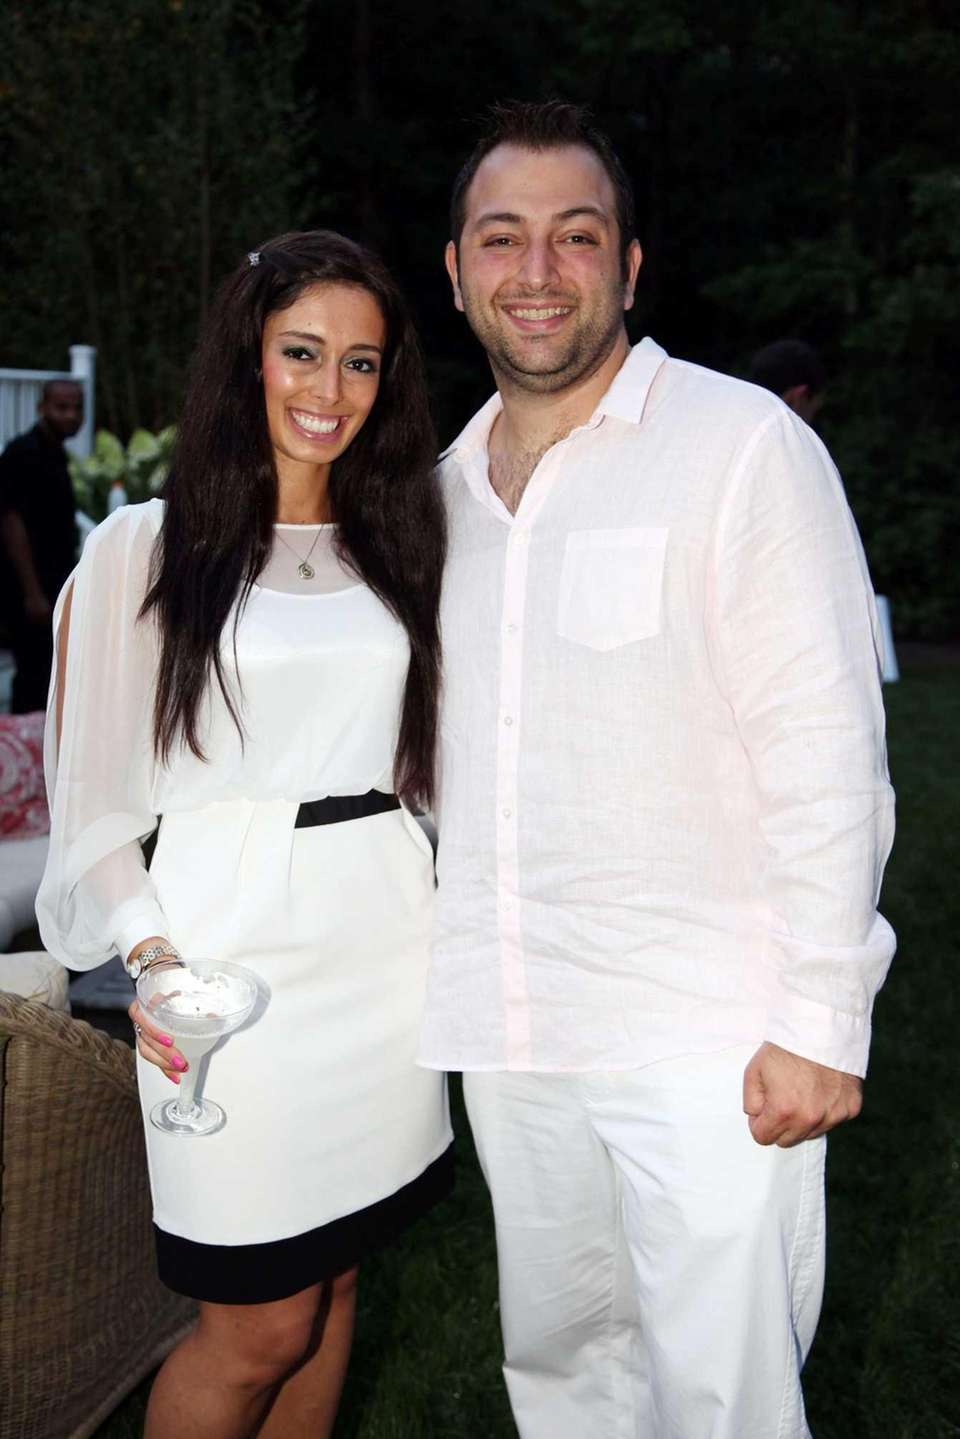 Sarah Schaefe and Justin Glazer attend the Hamptons